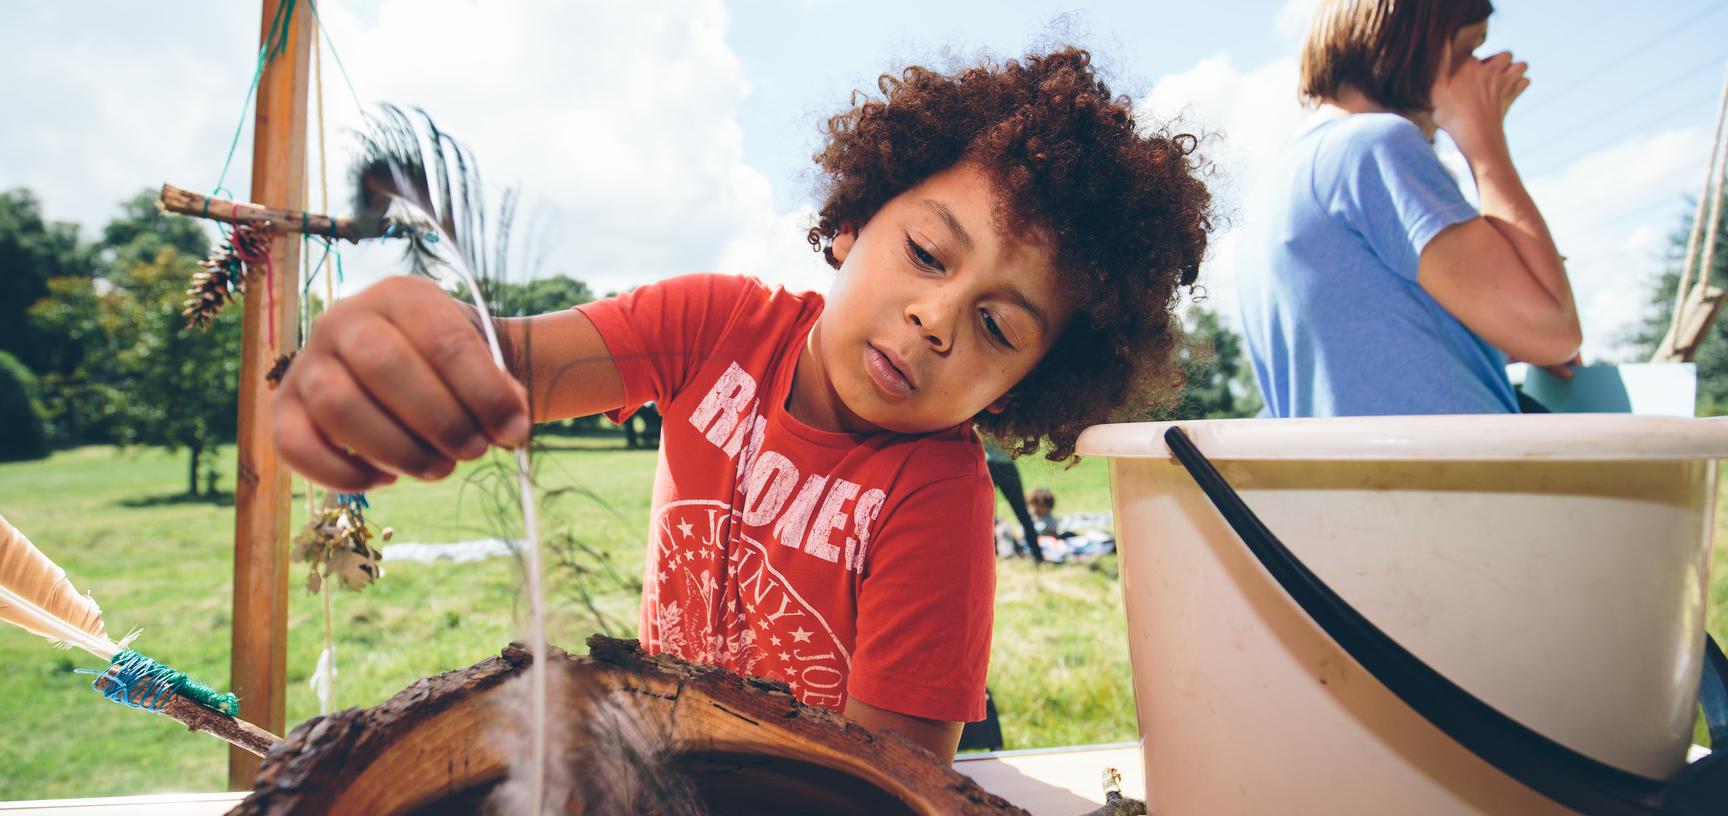 Arboretum Family Child Crafting (Wallman Lo Res)